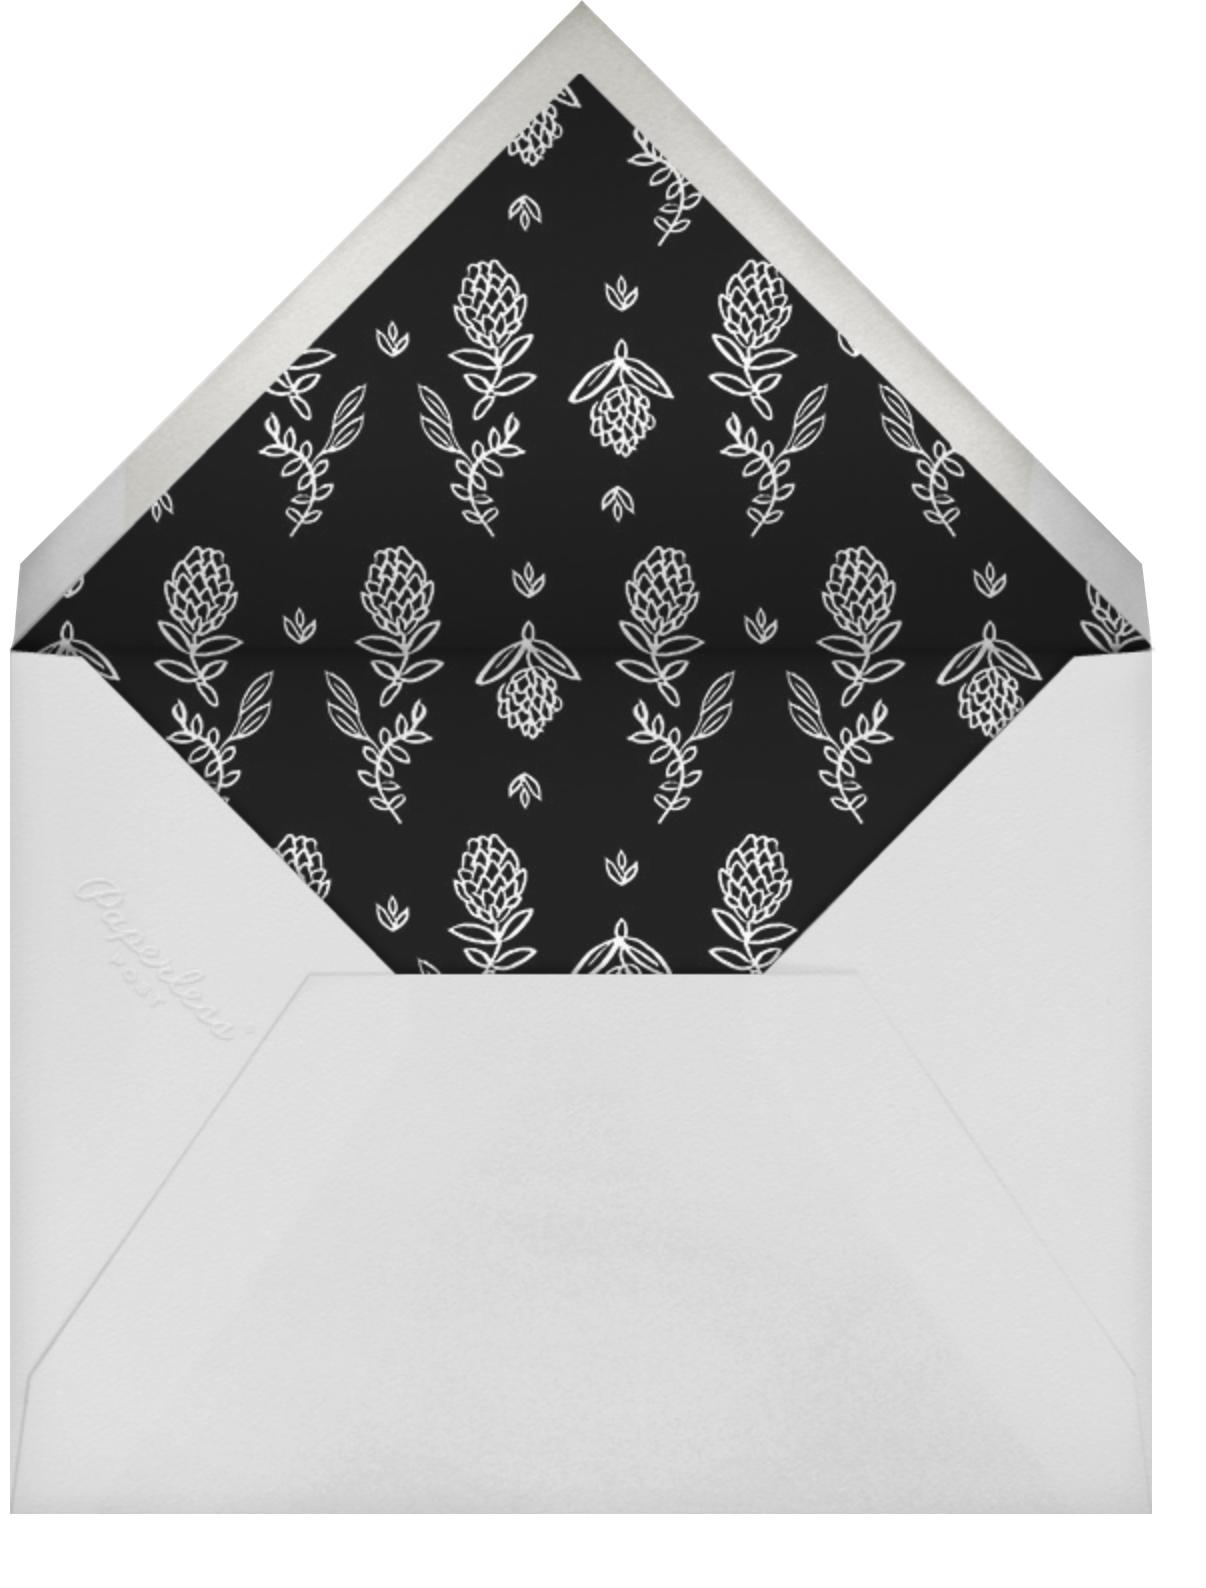 Botanical Lace (Photo) - Rose Gold - Rifle Paper Co. - Graduation party - envelope back